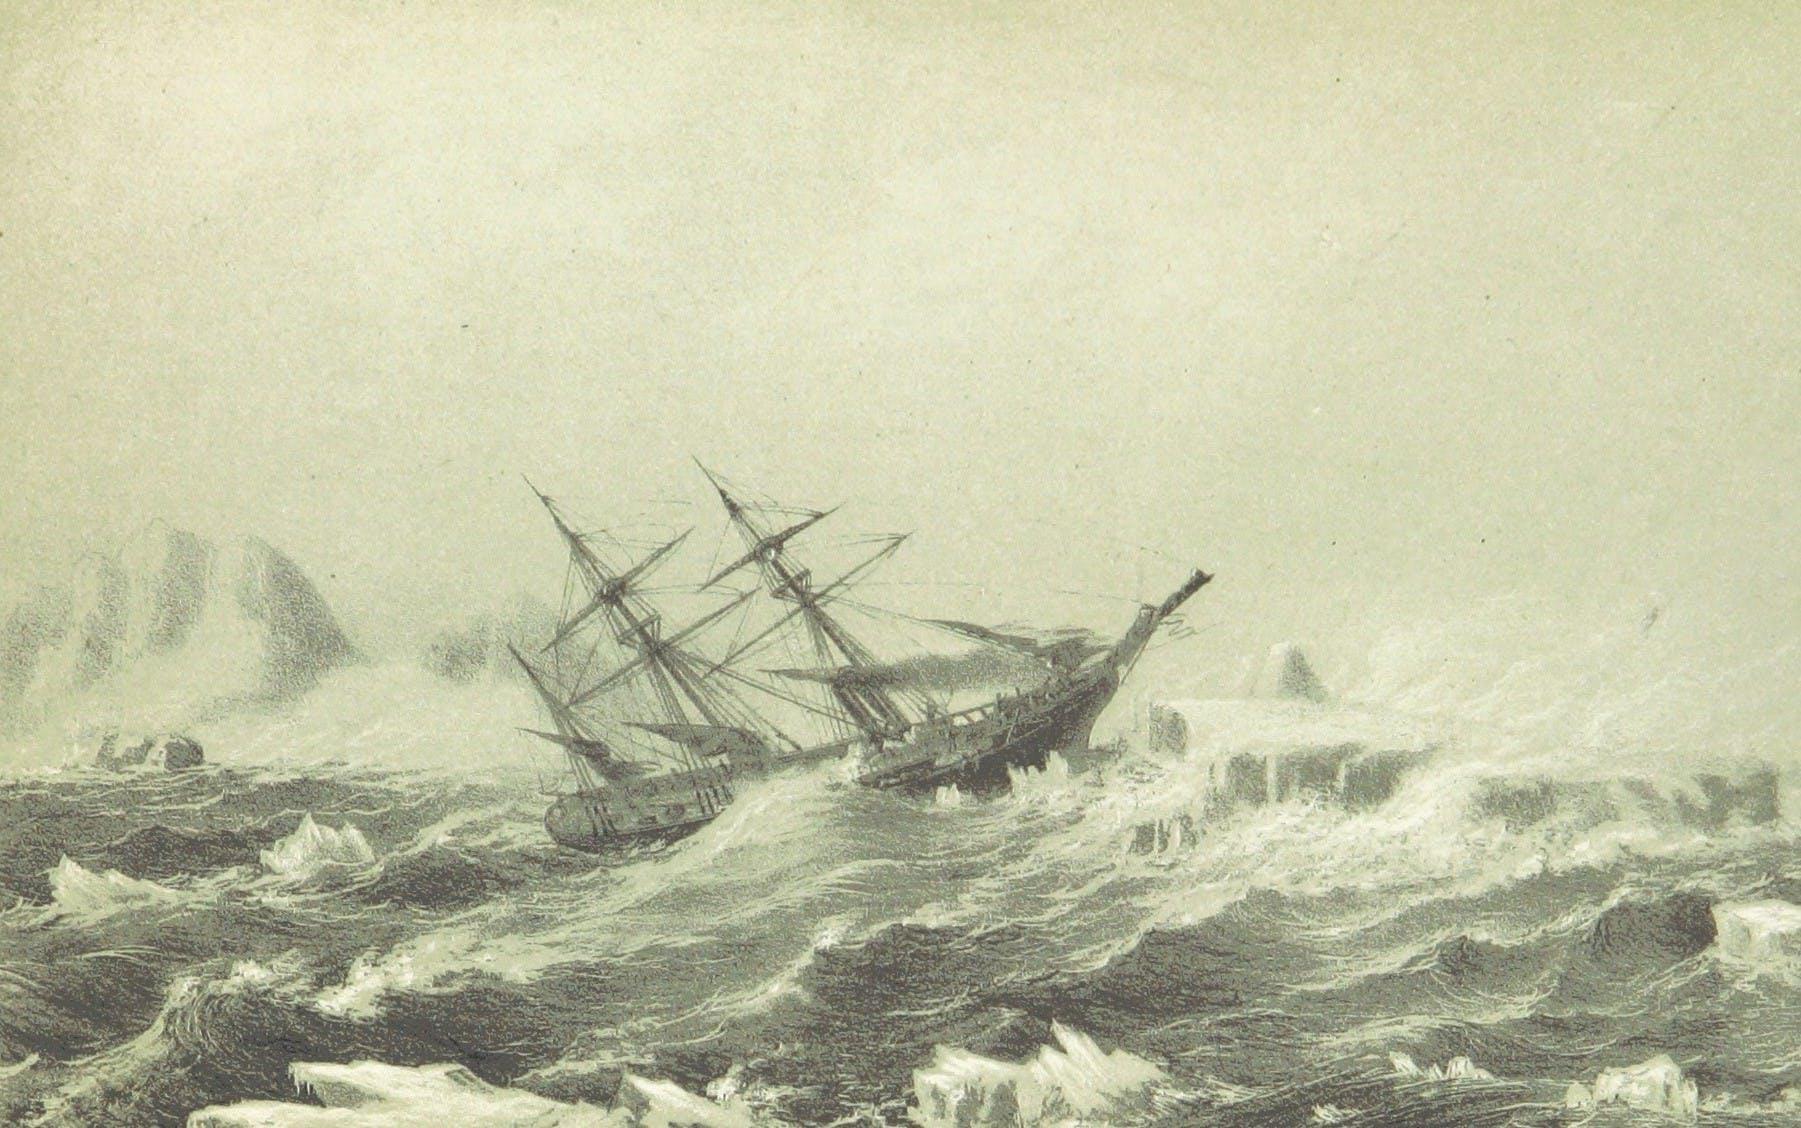 Stormy seas, indeed